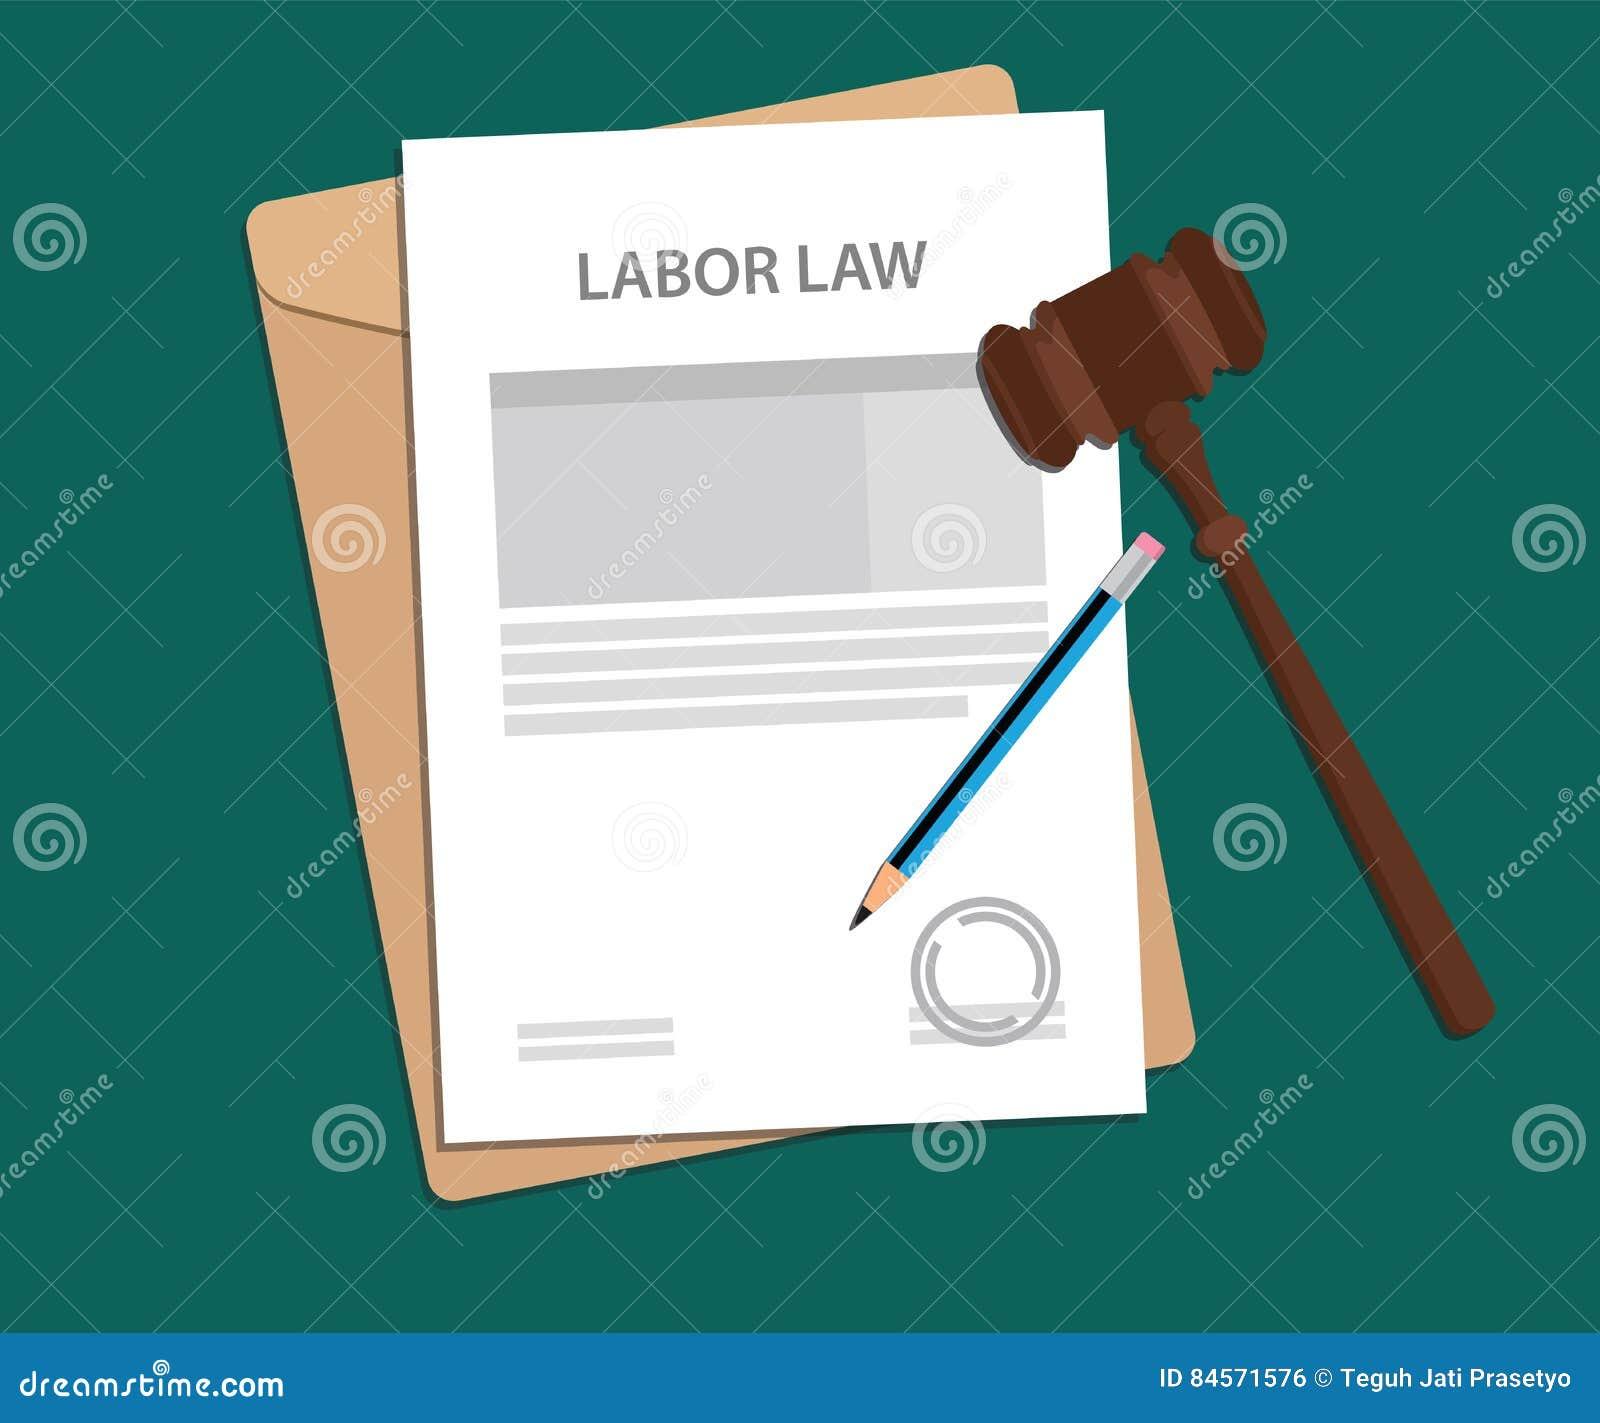 Legal concept of labor law illustration